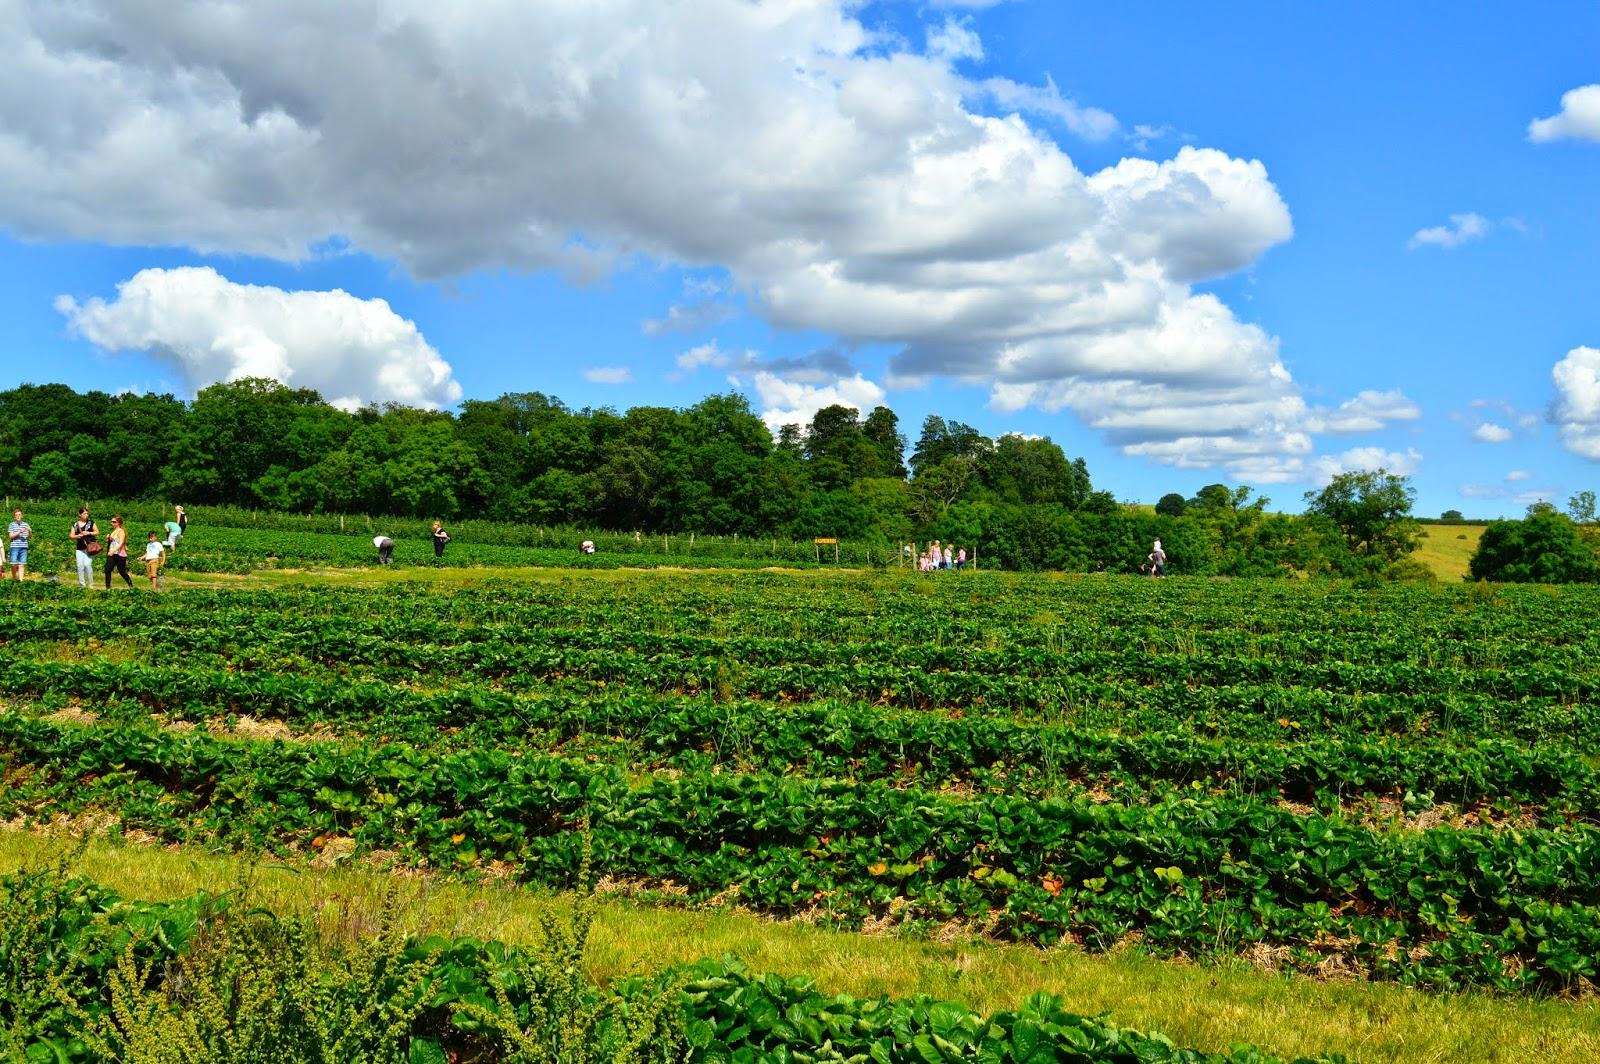 Pick your own strawberries at Brockbushes farm, Corbridge